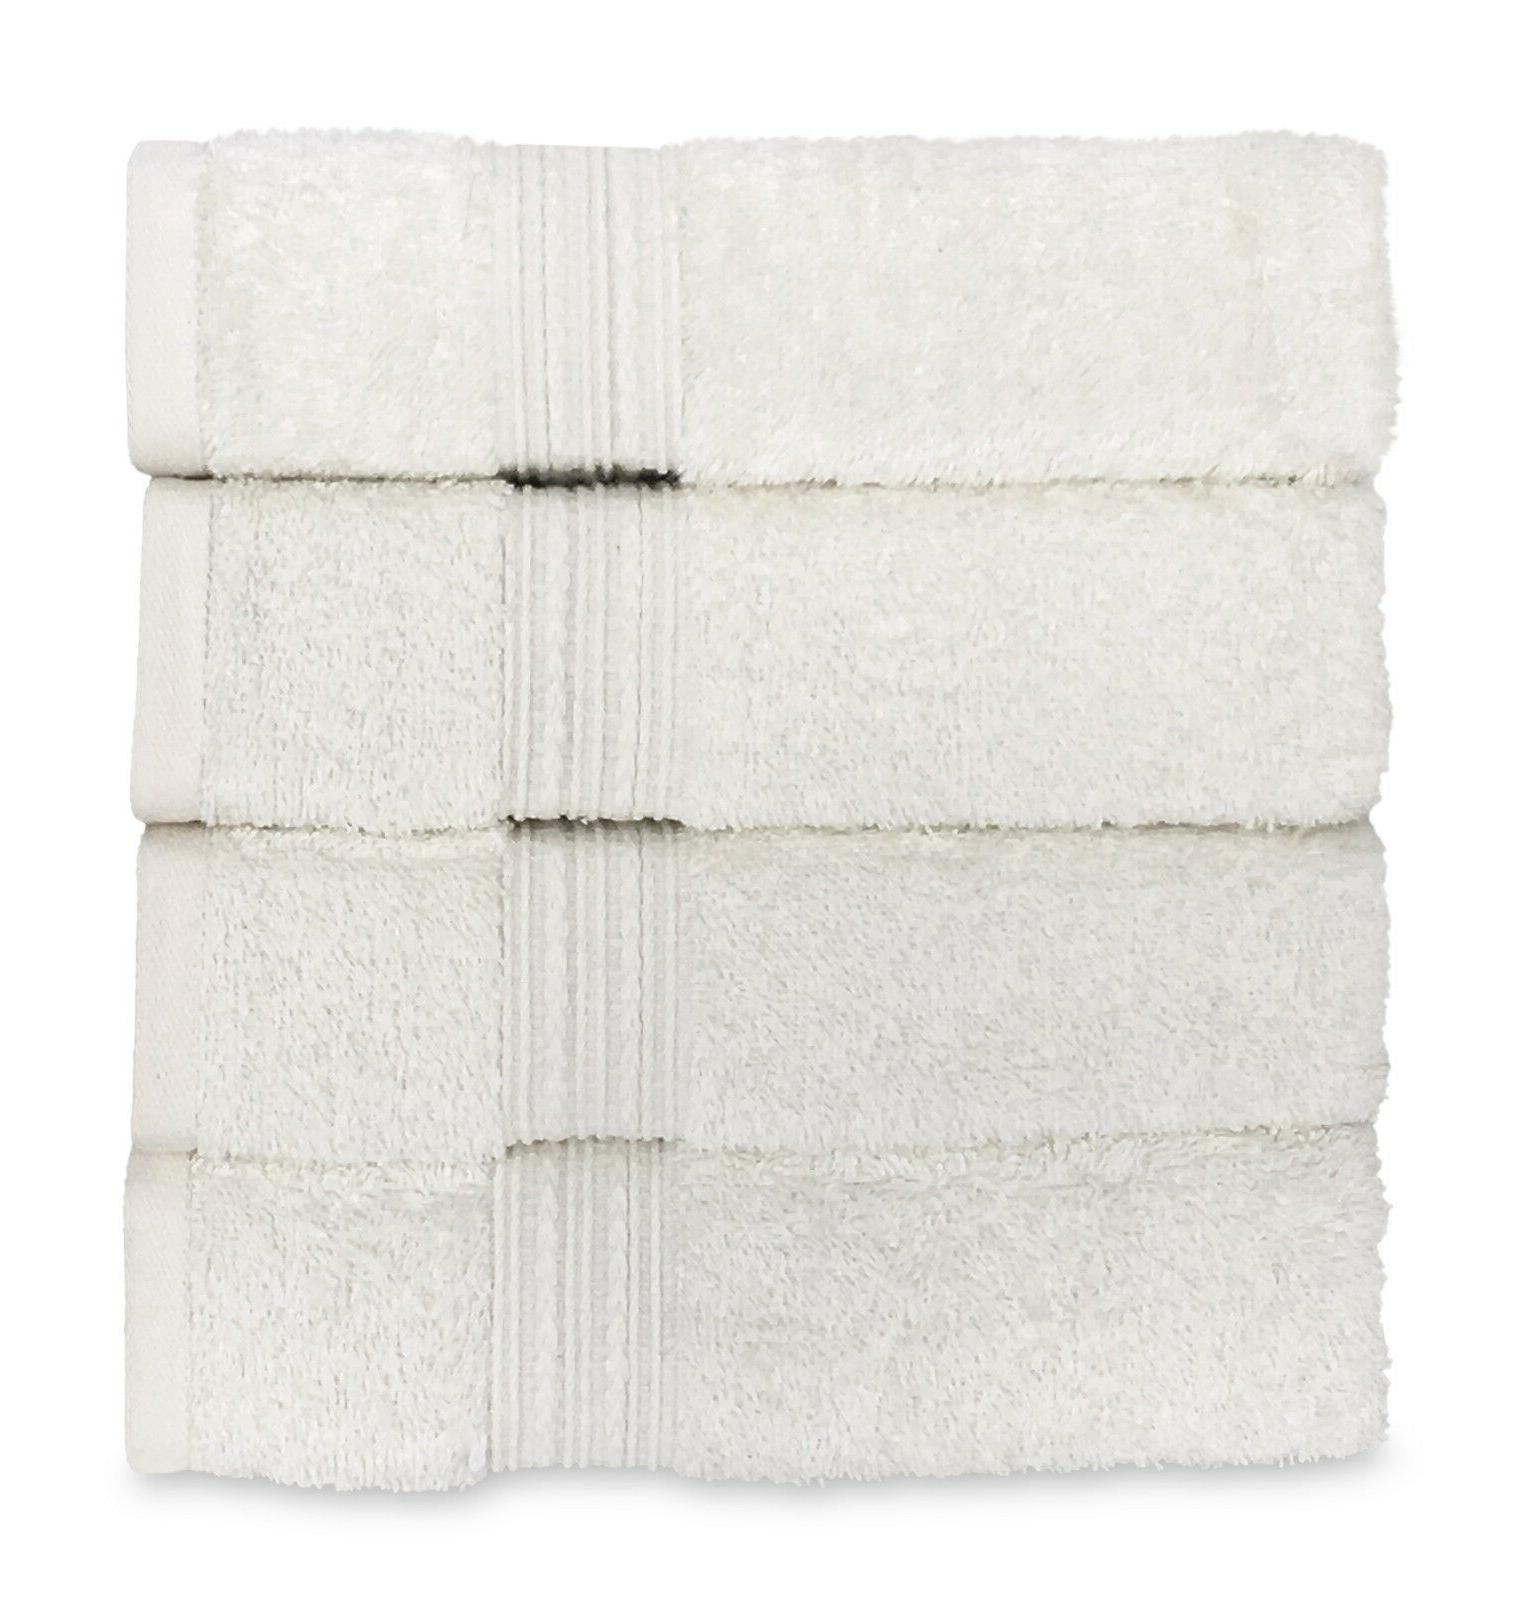 Goza Towels %100 Cotton Hand Bath, Home, Gym, SPA 4